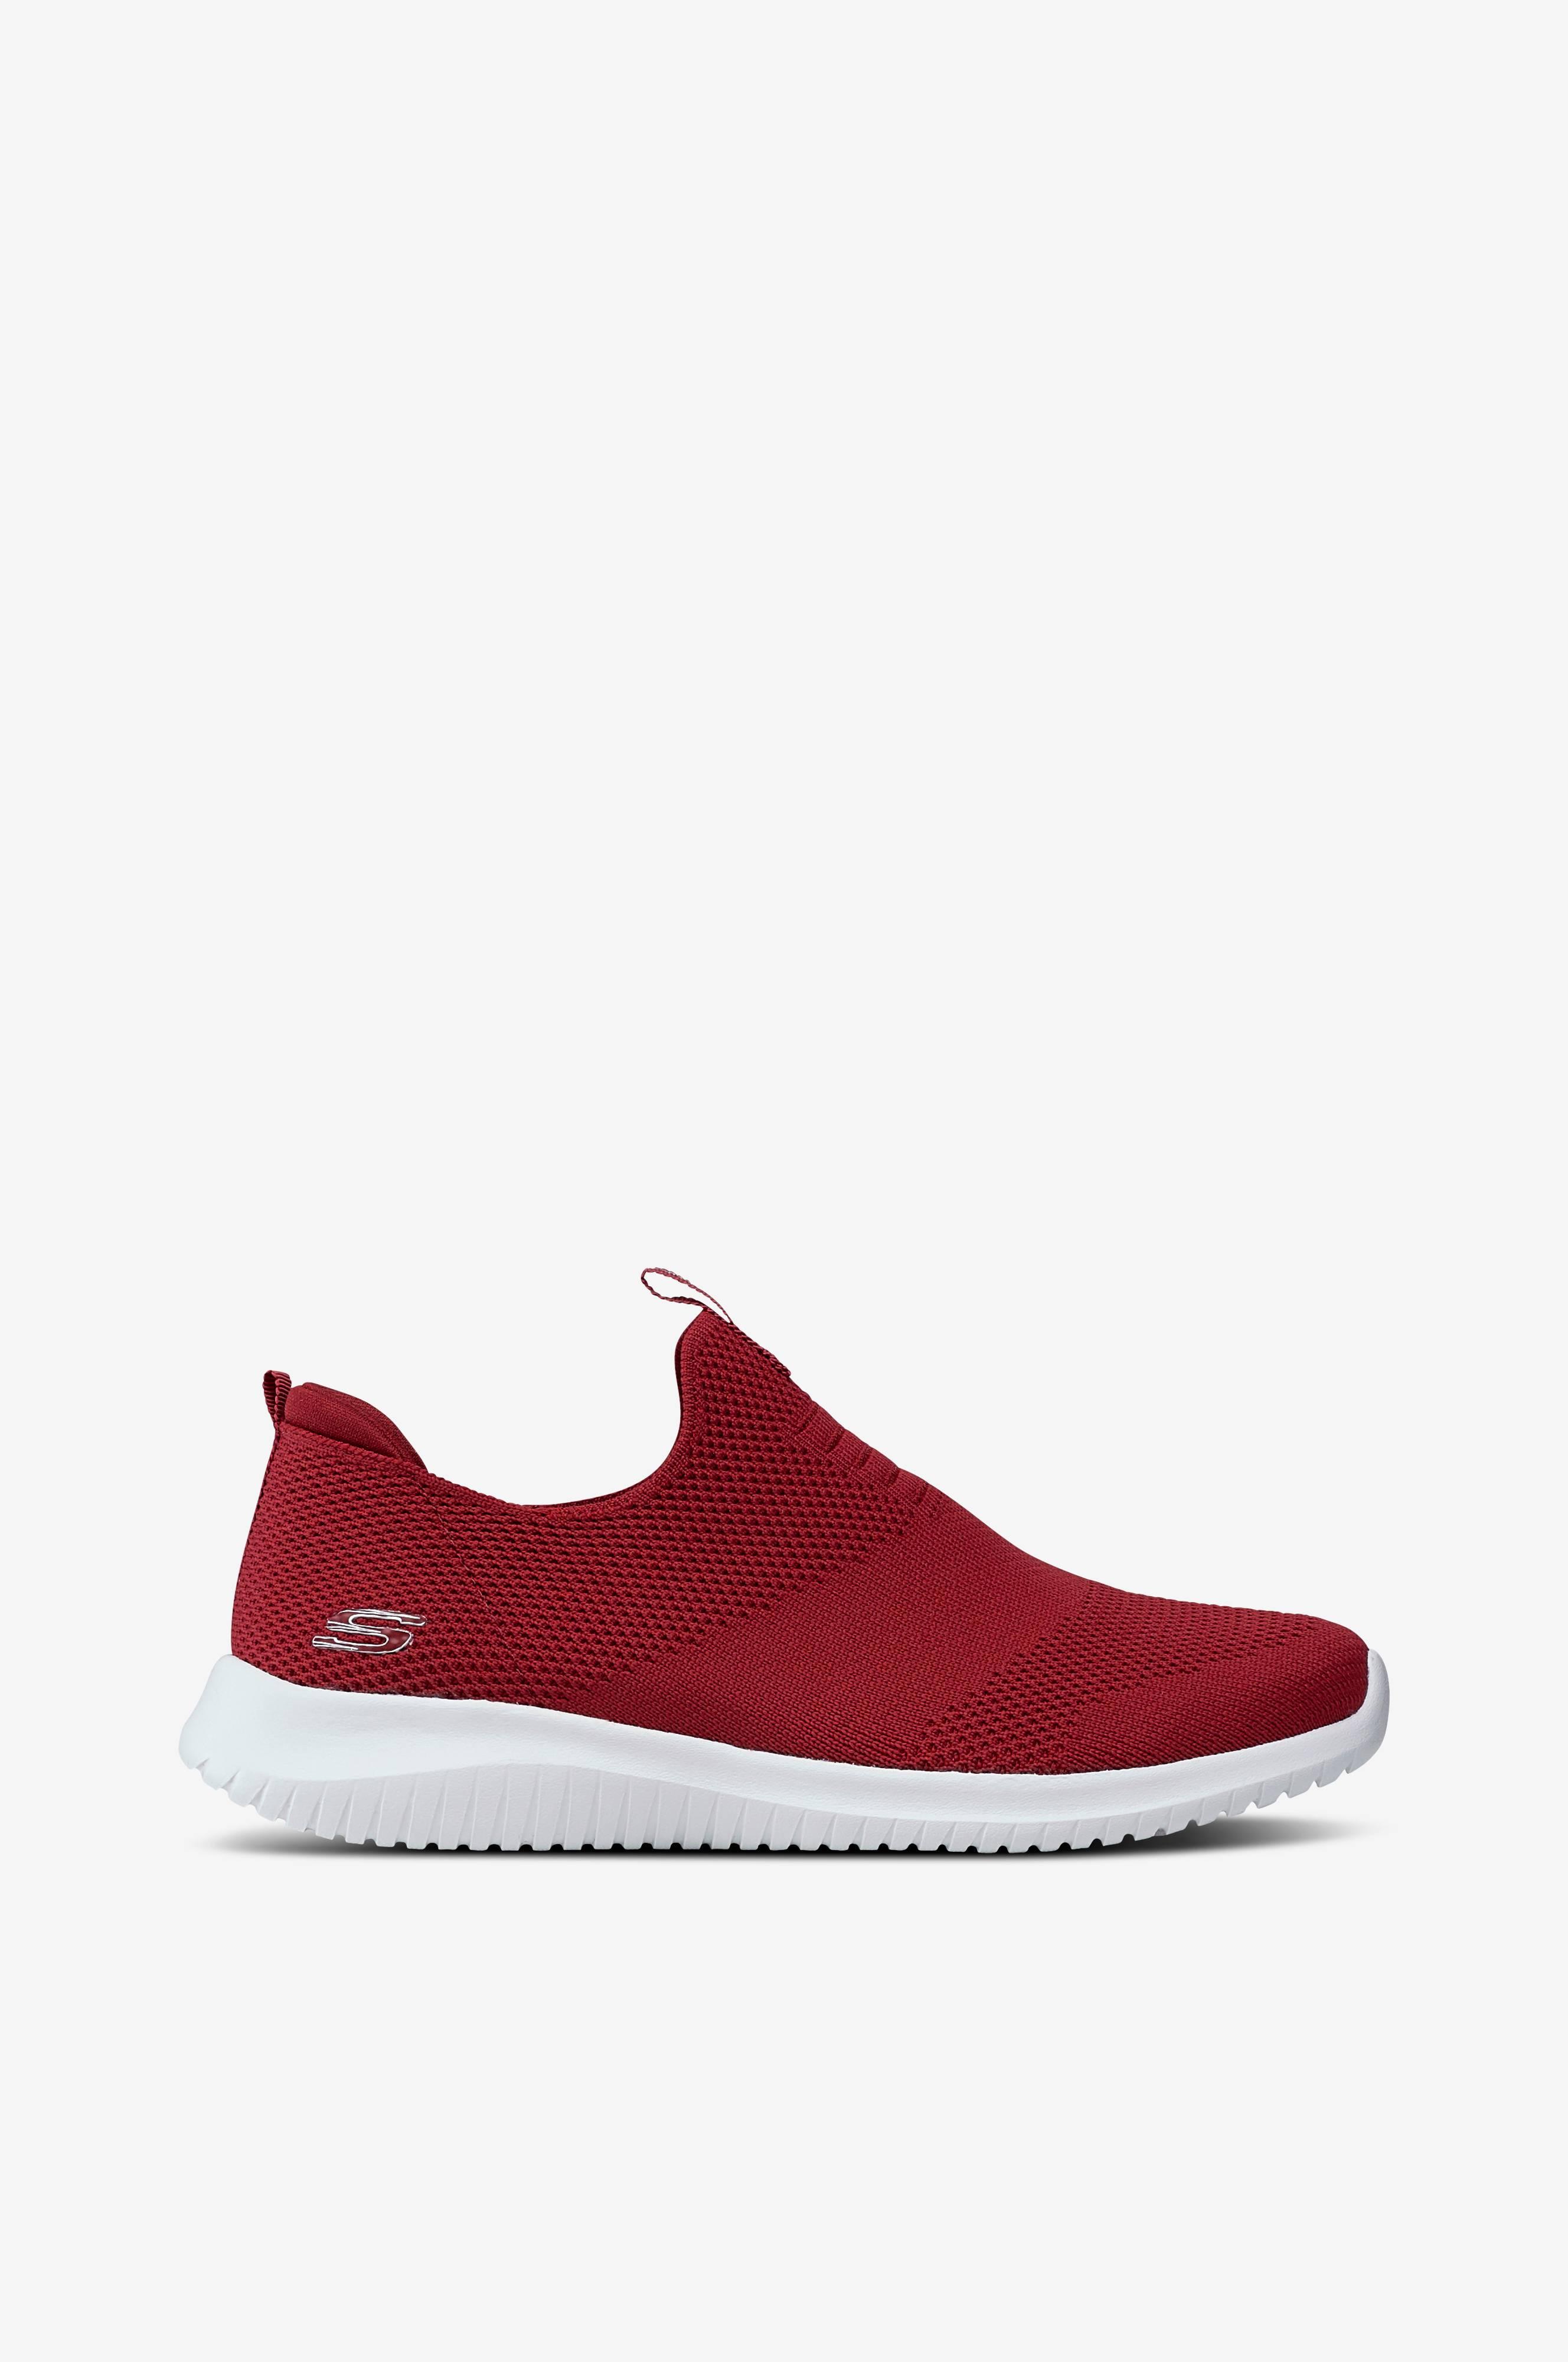 Skechers Sneakers Ultra Flex First Take Rød Dame Ellos.dk